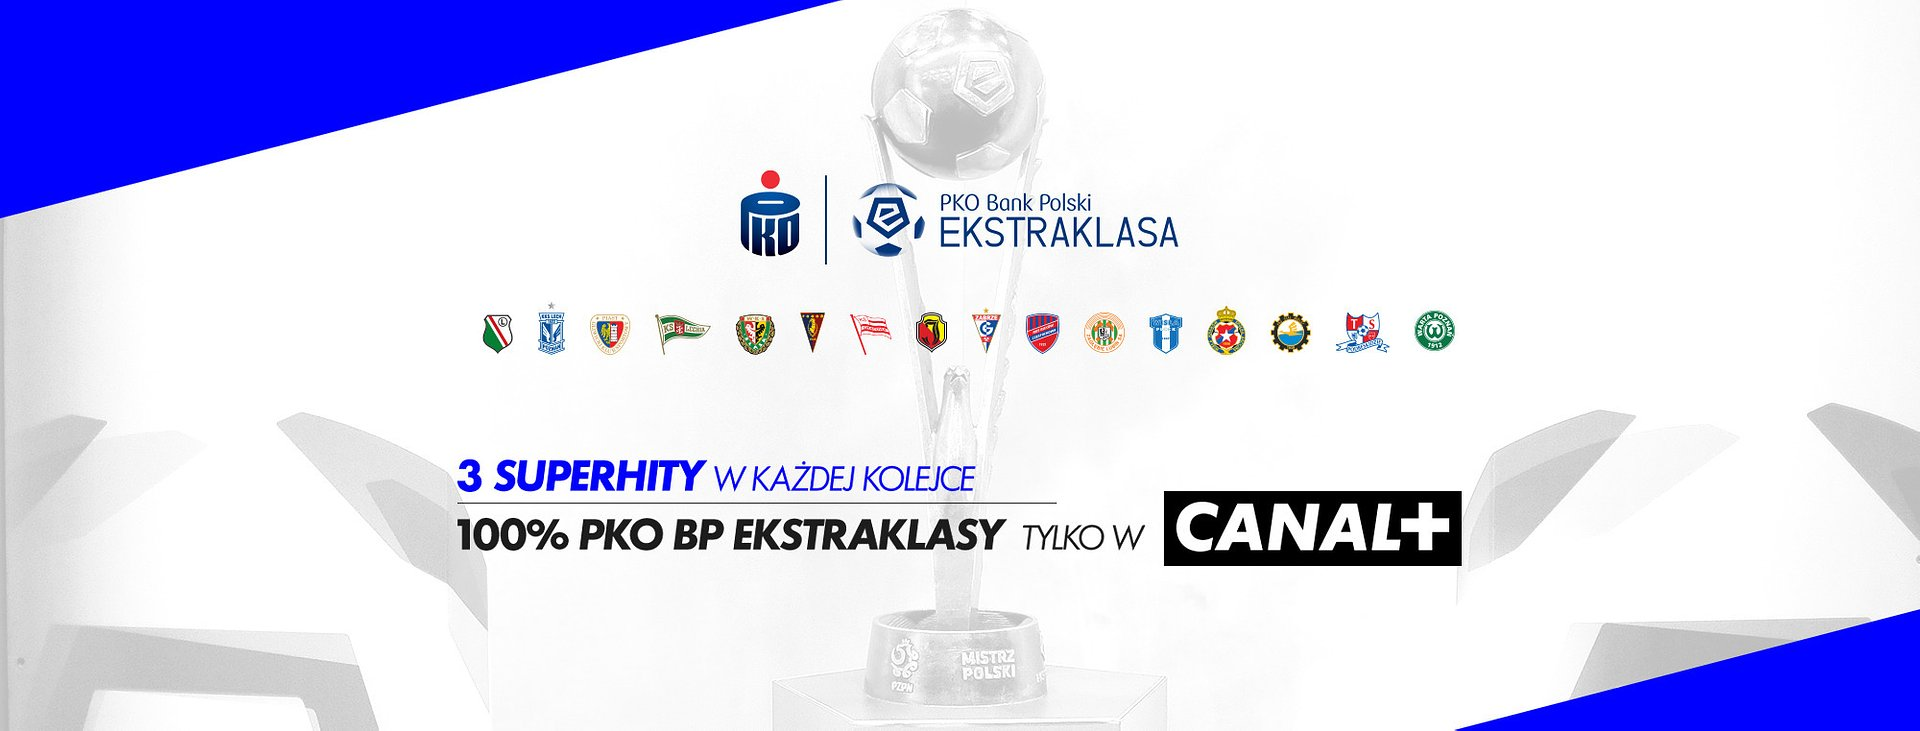 3. kolejka PKO BP Ekstraklasy w CANAL+